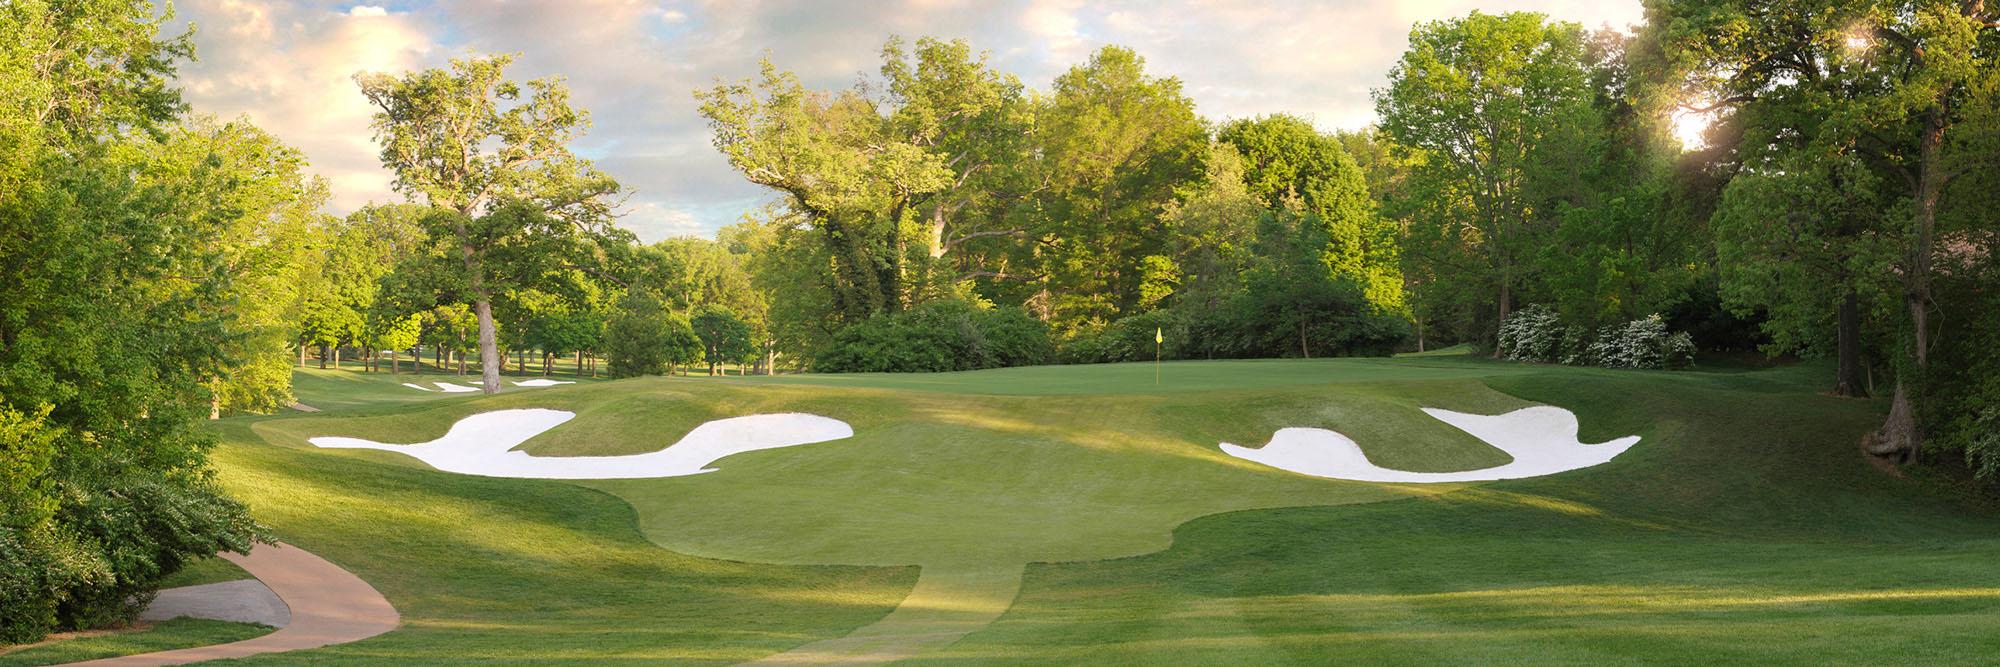 Golf Course Image - Bellerive No. 16